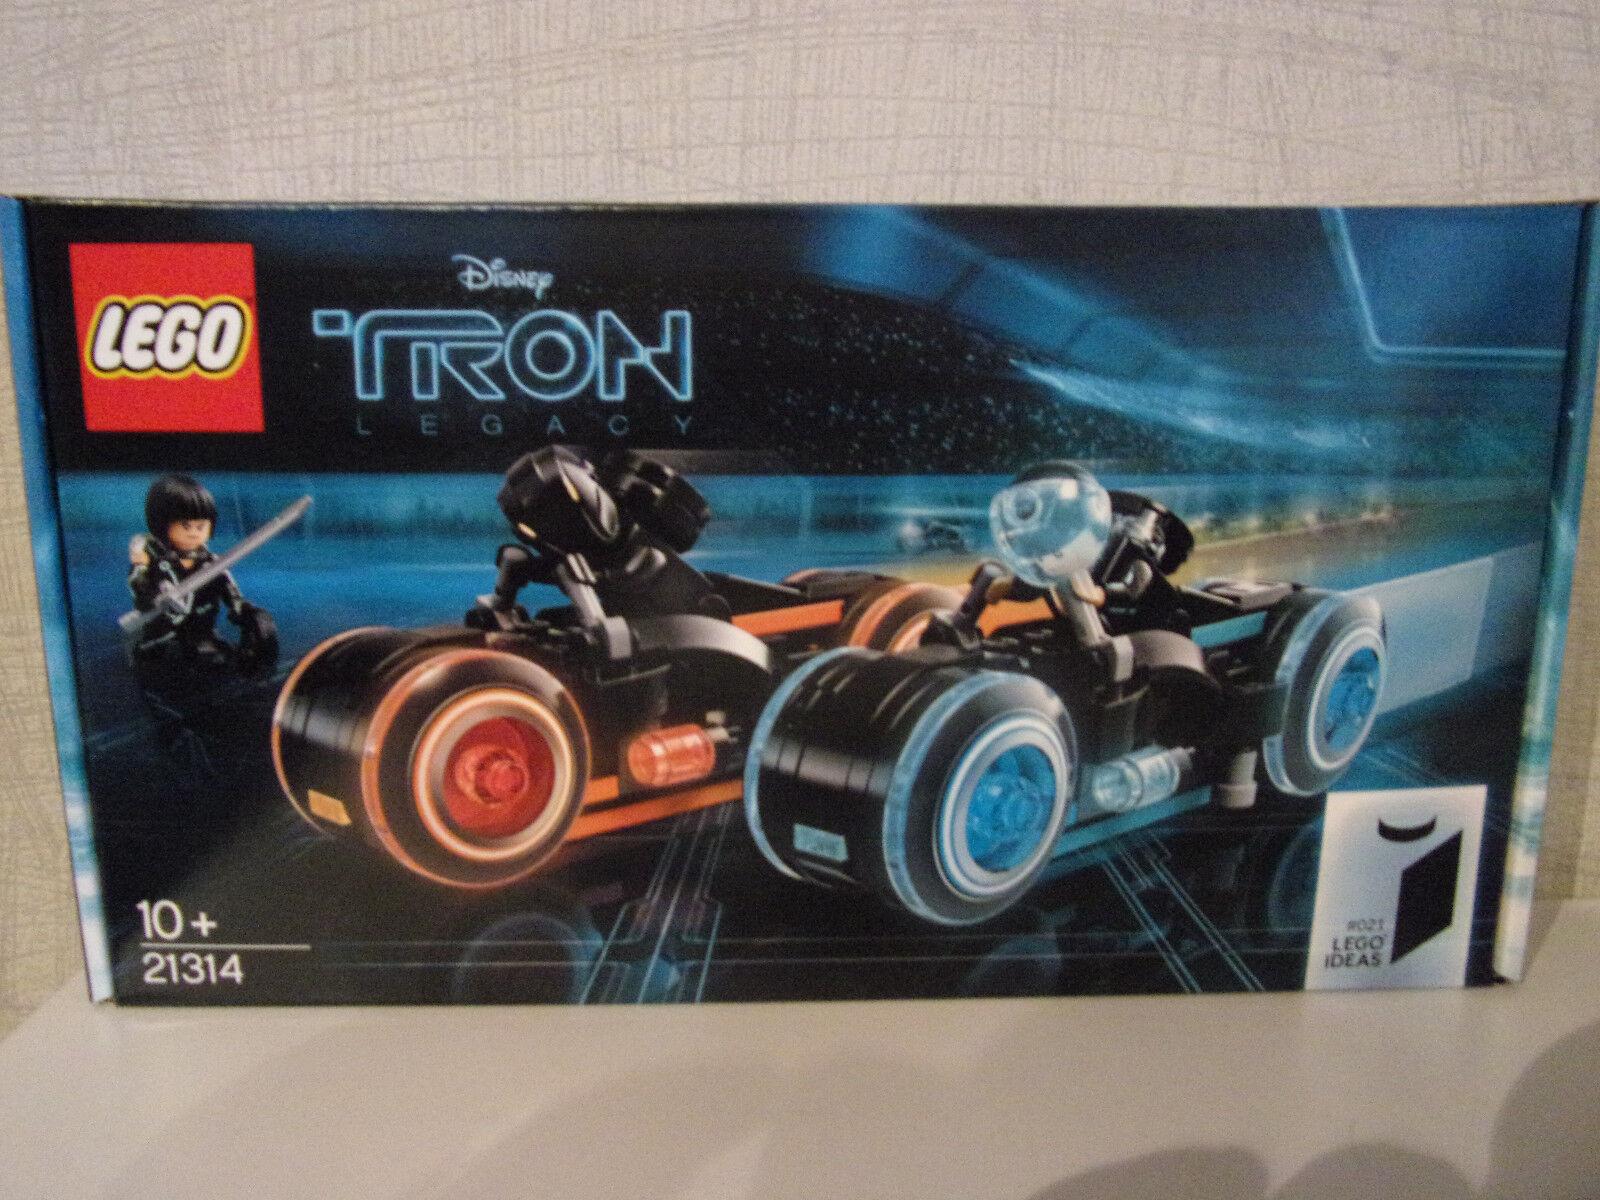 Lego Ideas 21314 Tron  Legacy-NOUVEAU & NEUF dans sa boîte